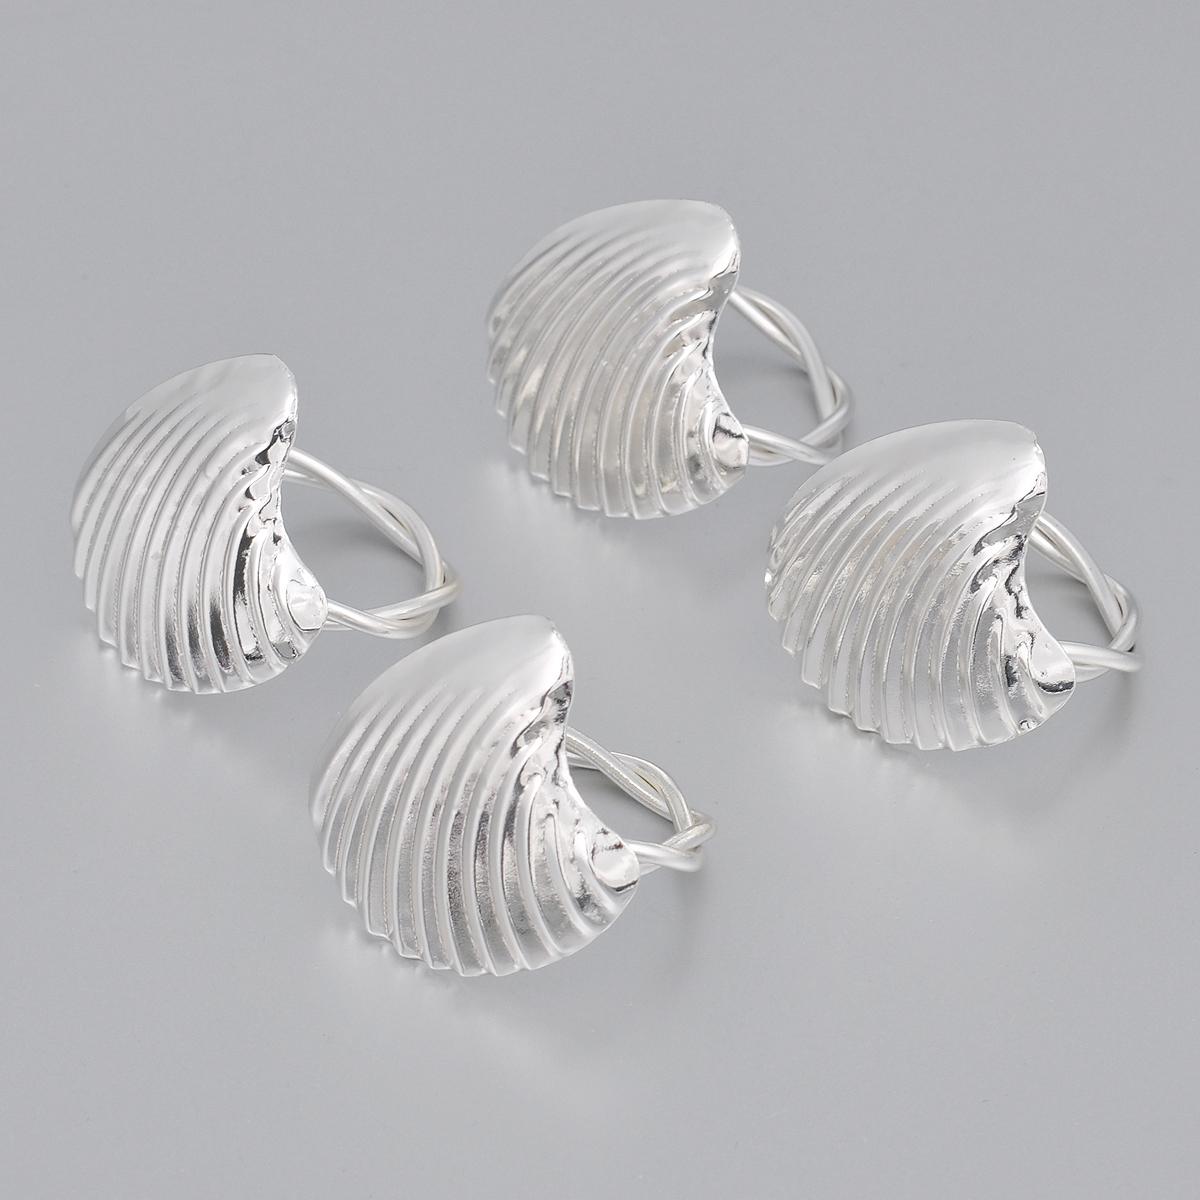 Набор колец для салфеток Marquis Ракушки, 4 шт кольца для салфеток marquis 3042 mr